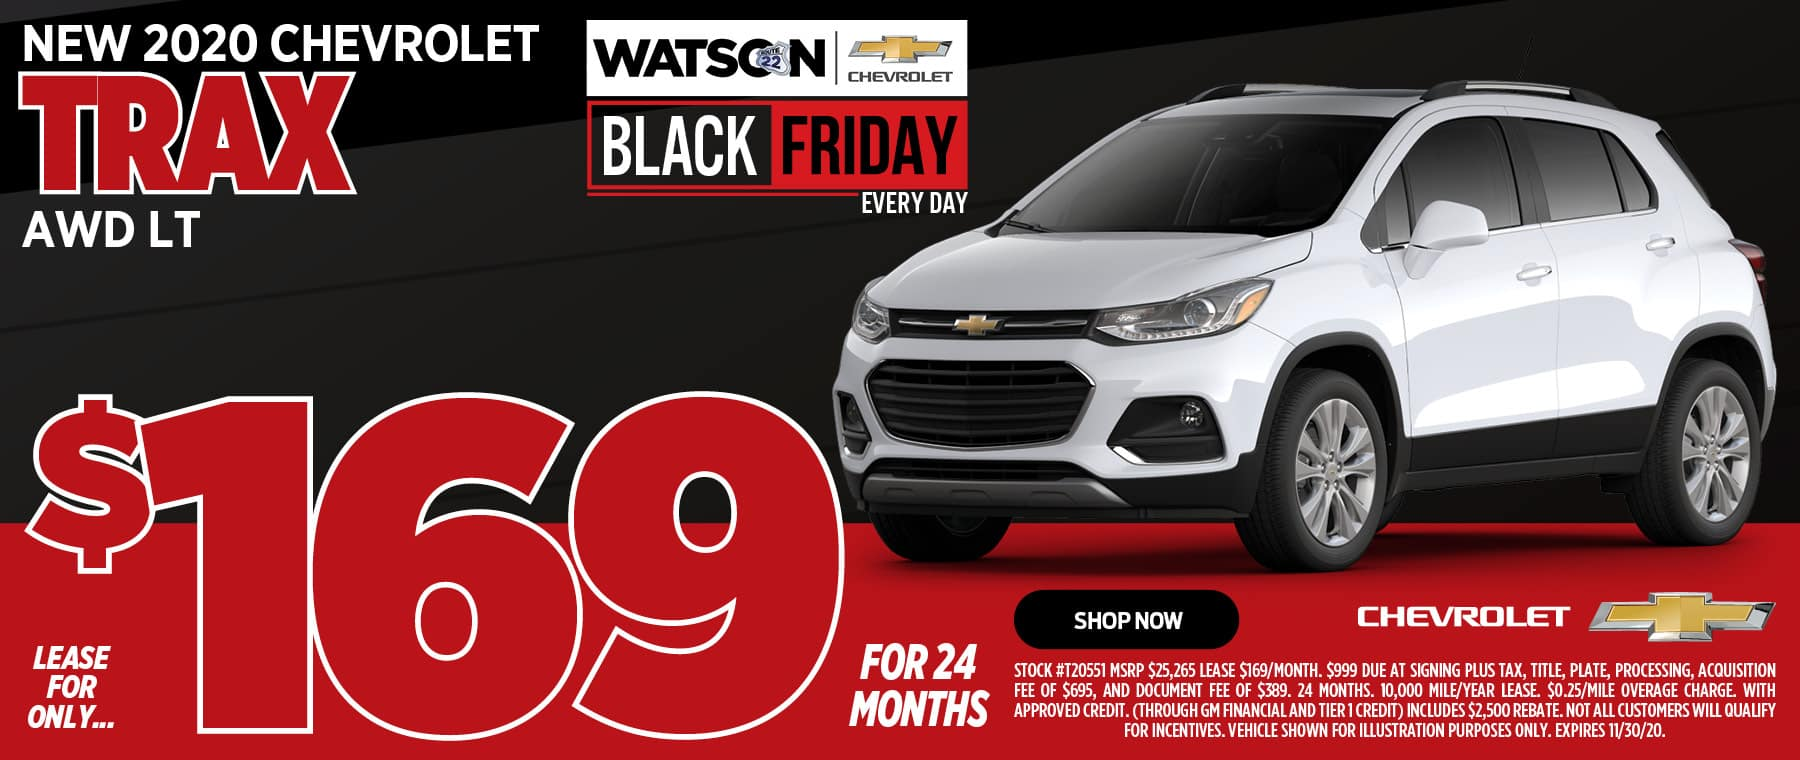 Watson Chevrolet Pittsburgh Area Chevrolet Dealer